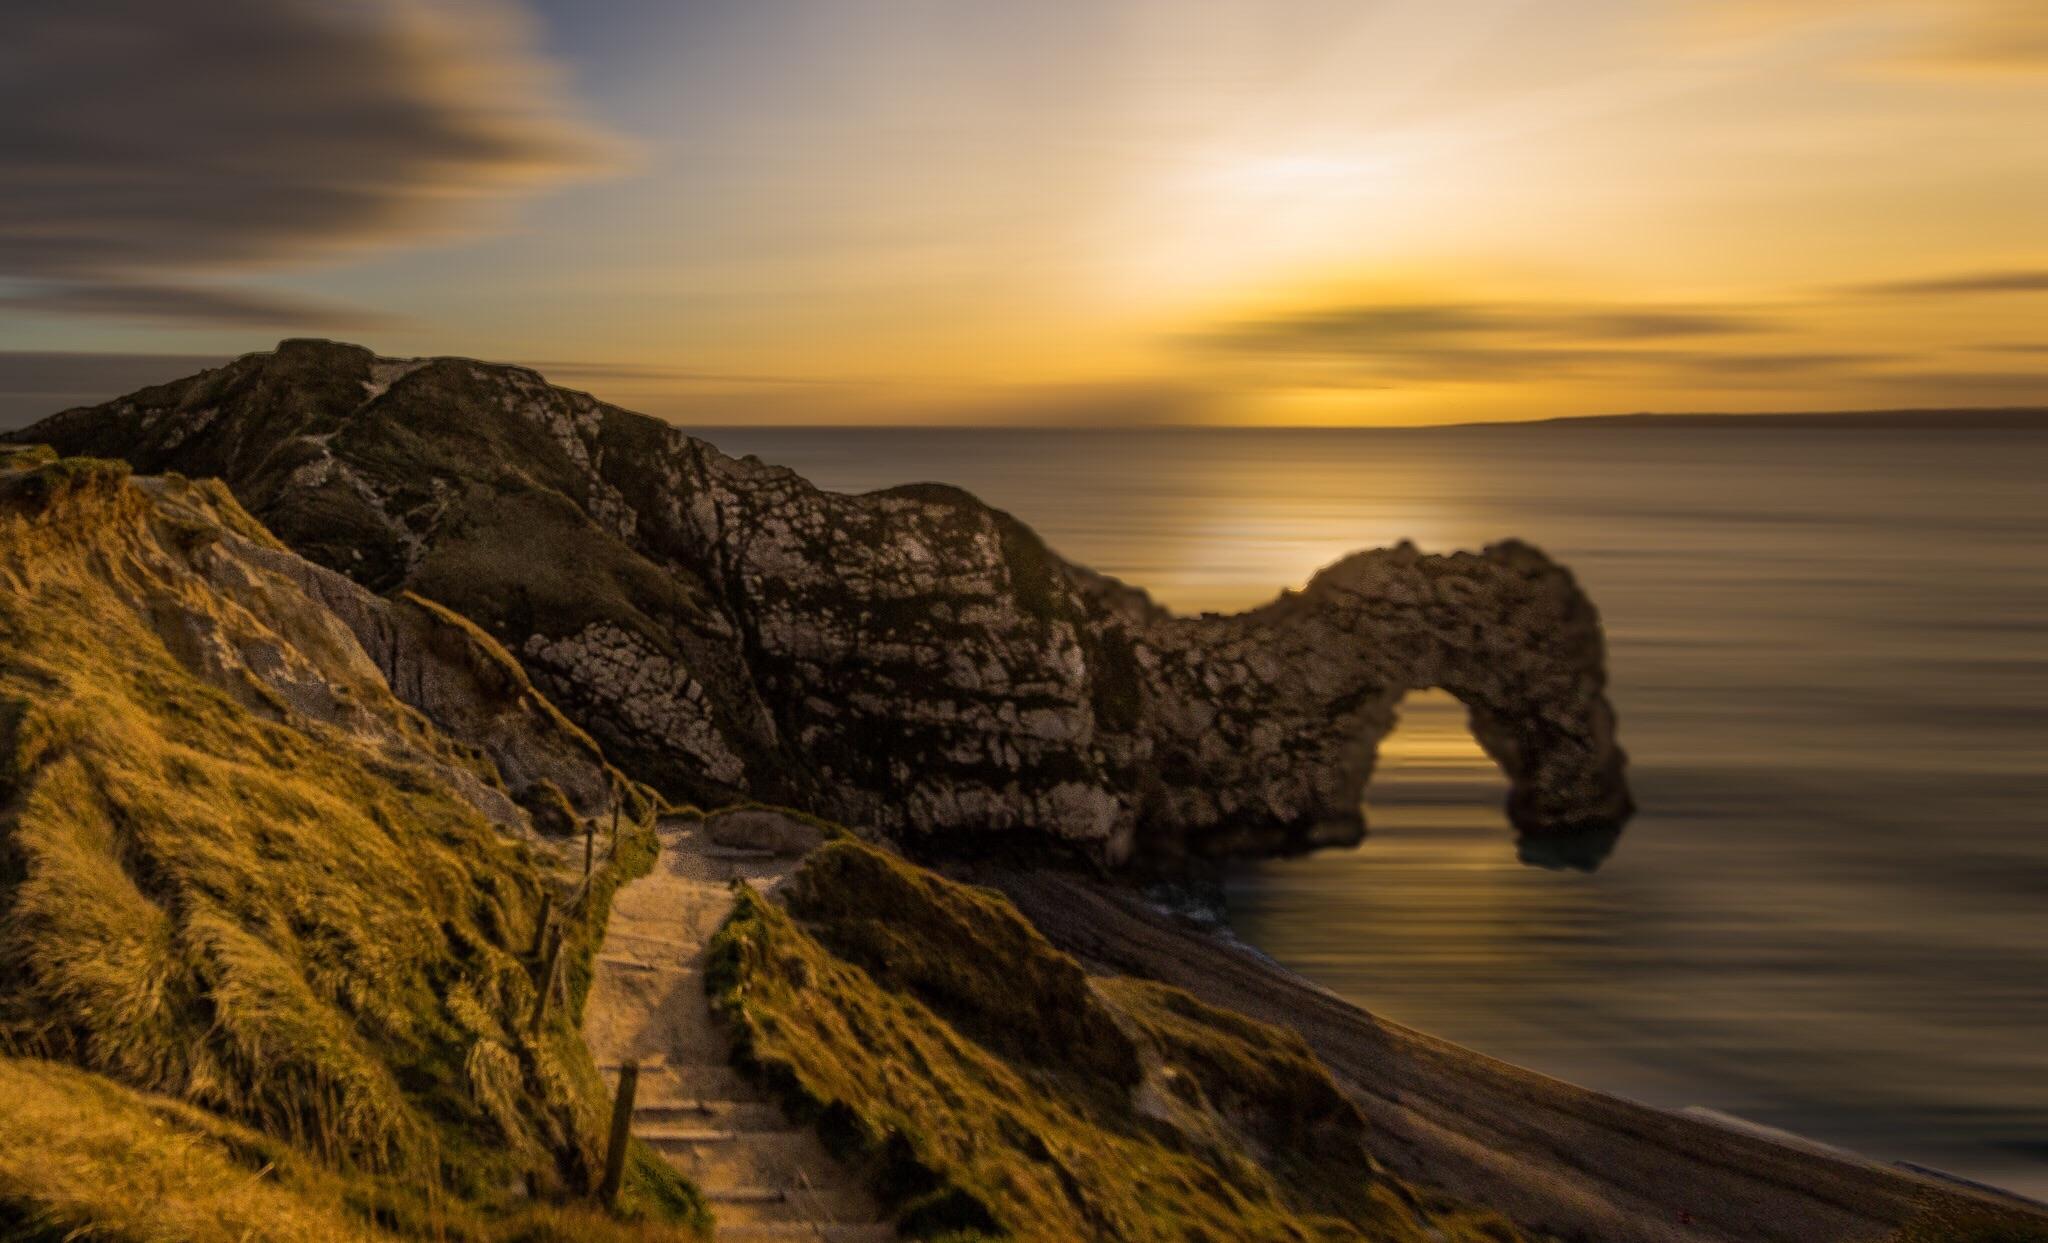 Durdle Door by Dorset Photographer Rick McEvoy